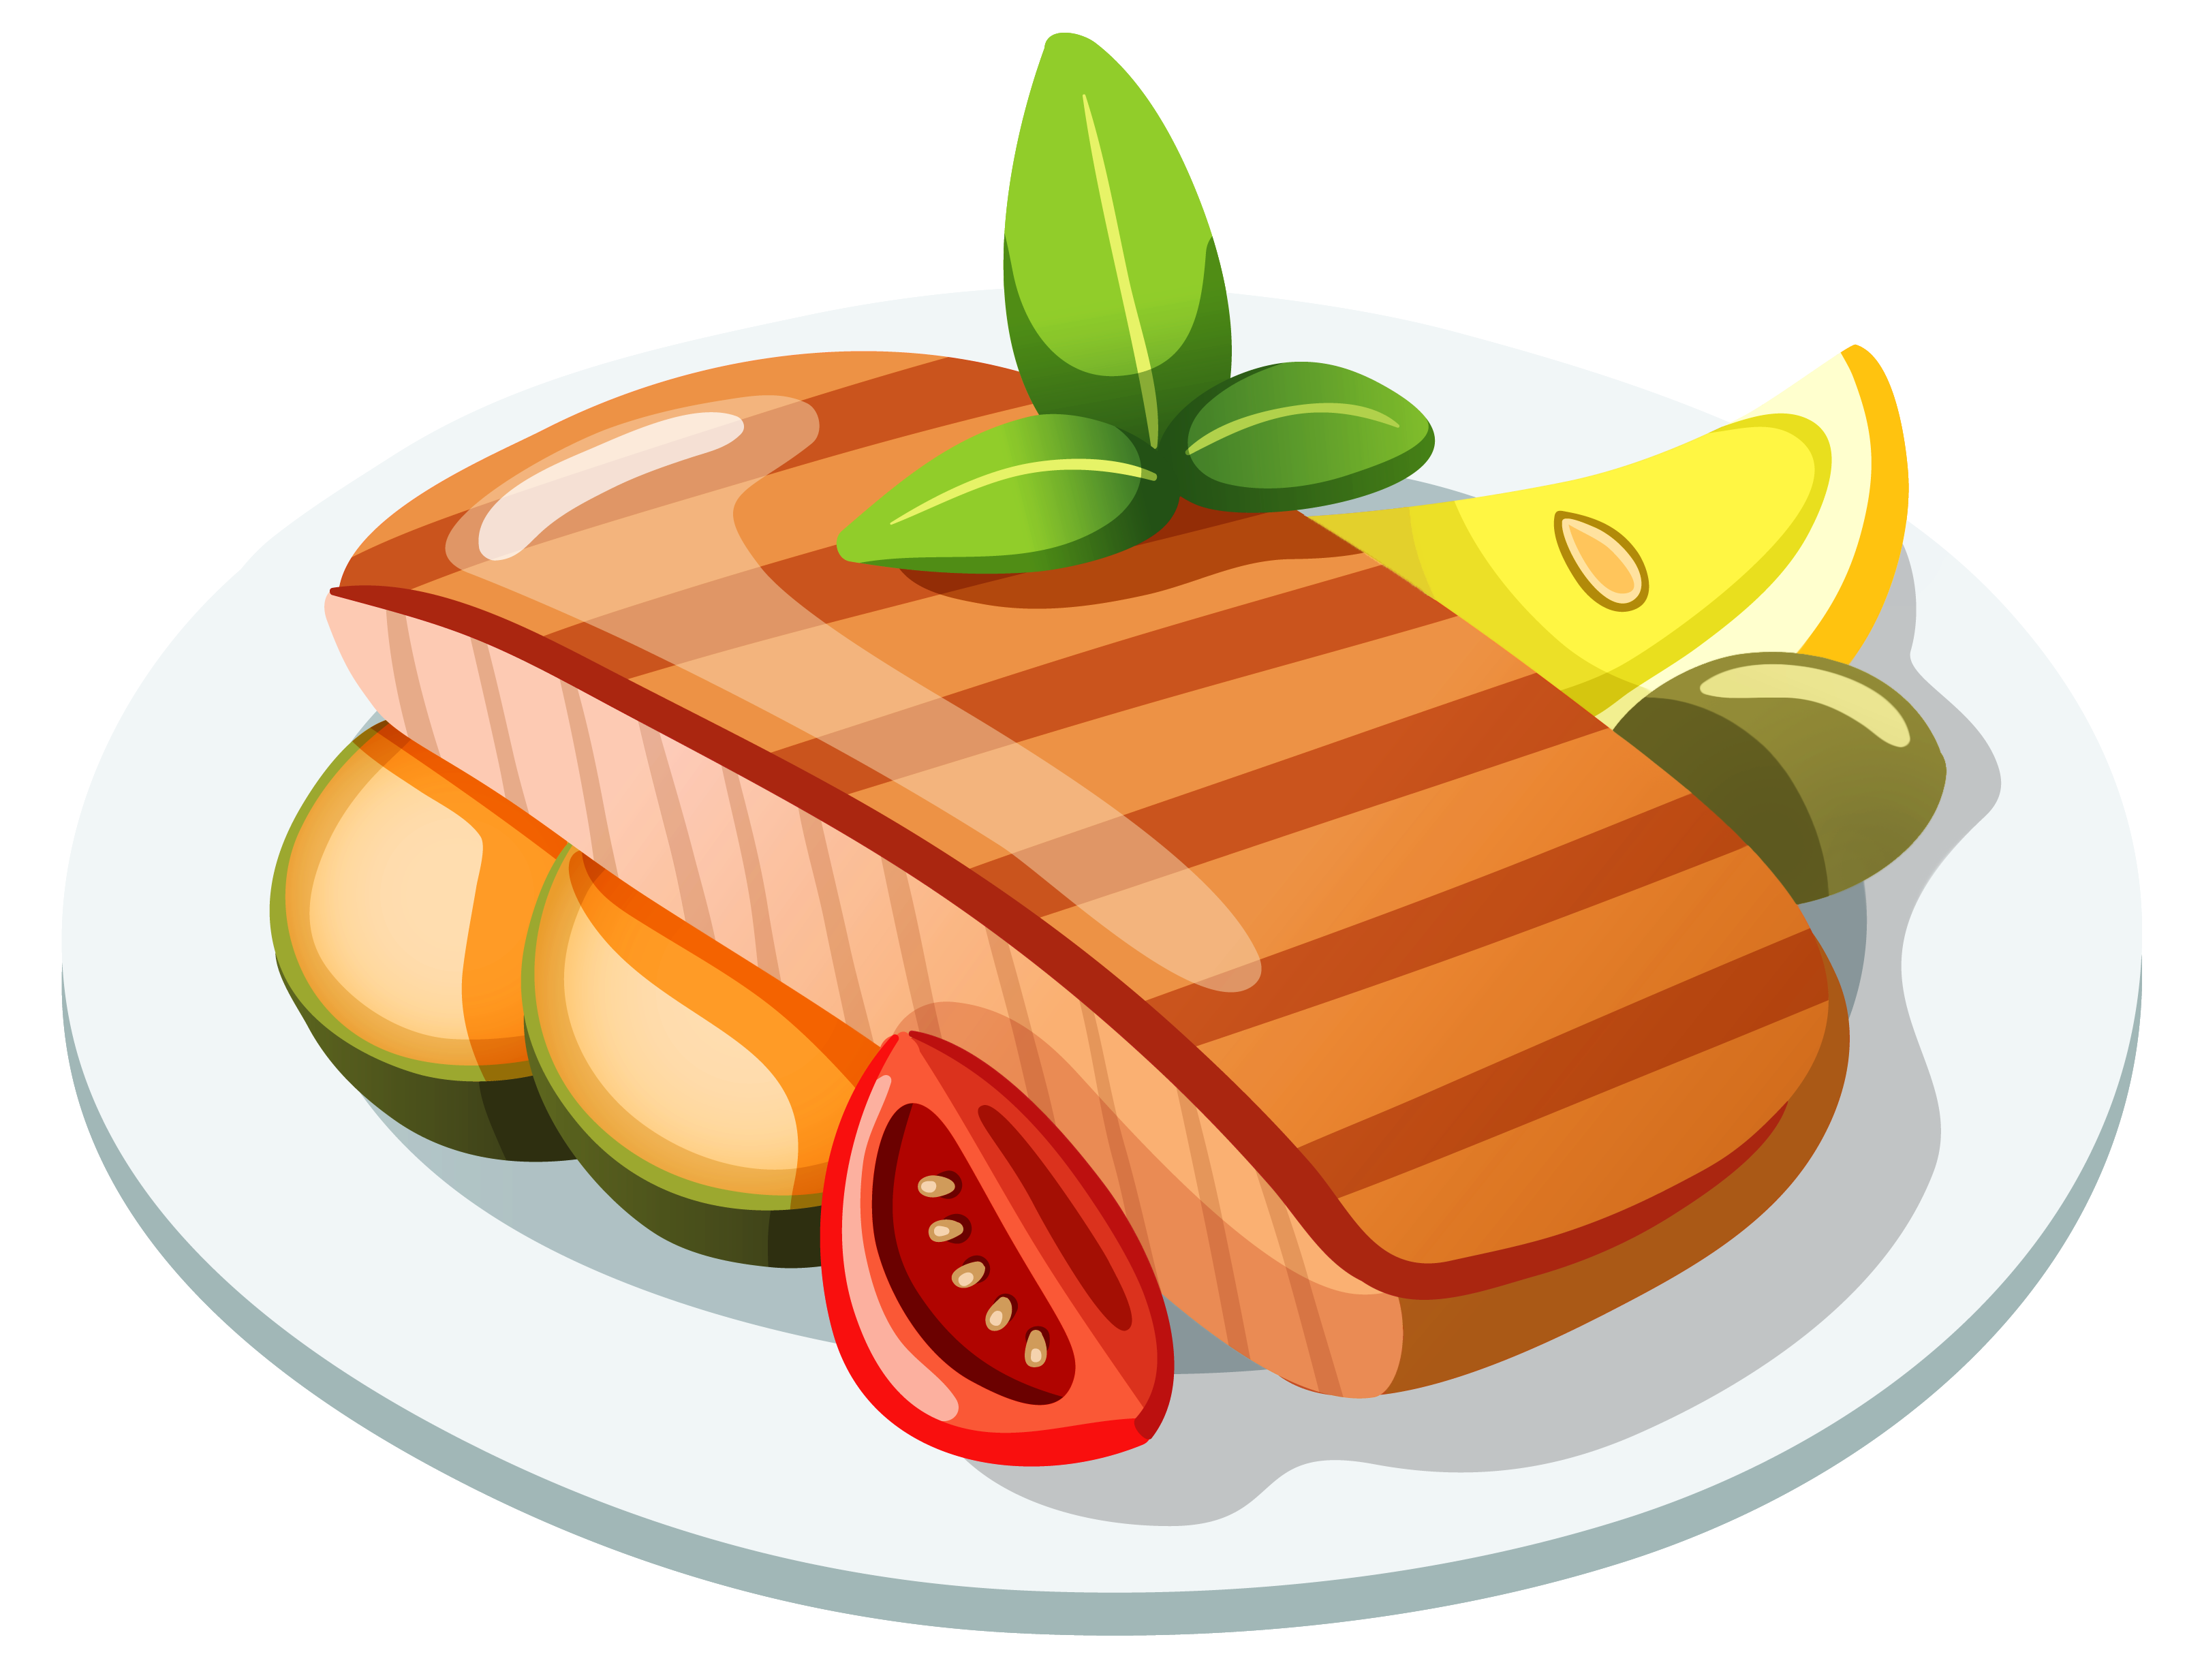 Steak clipart 6 image